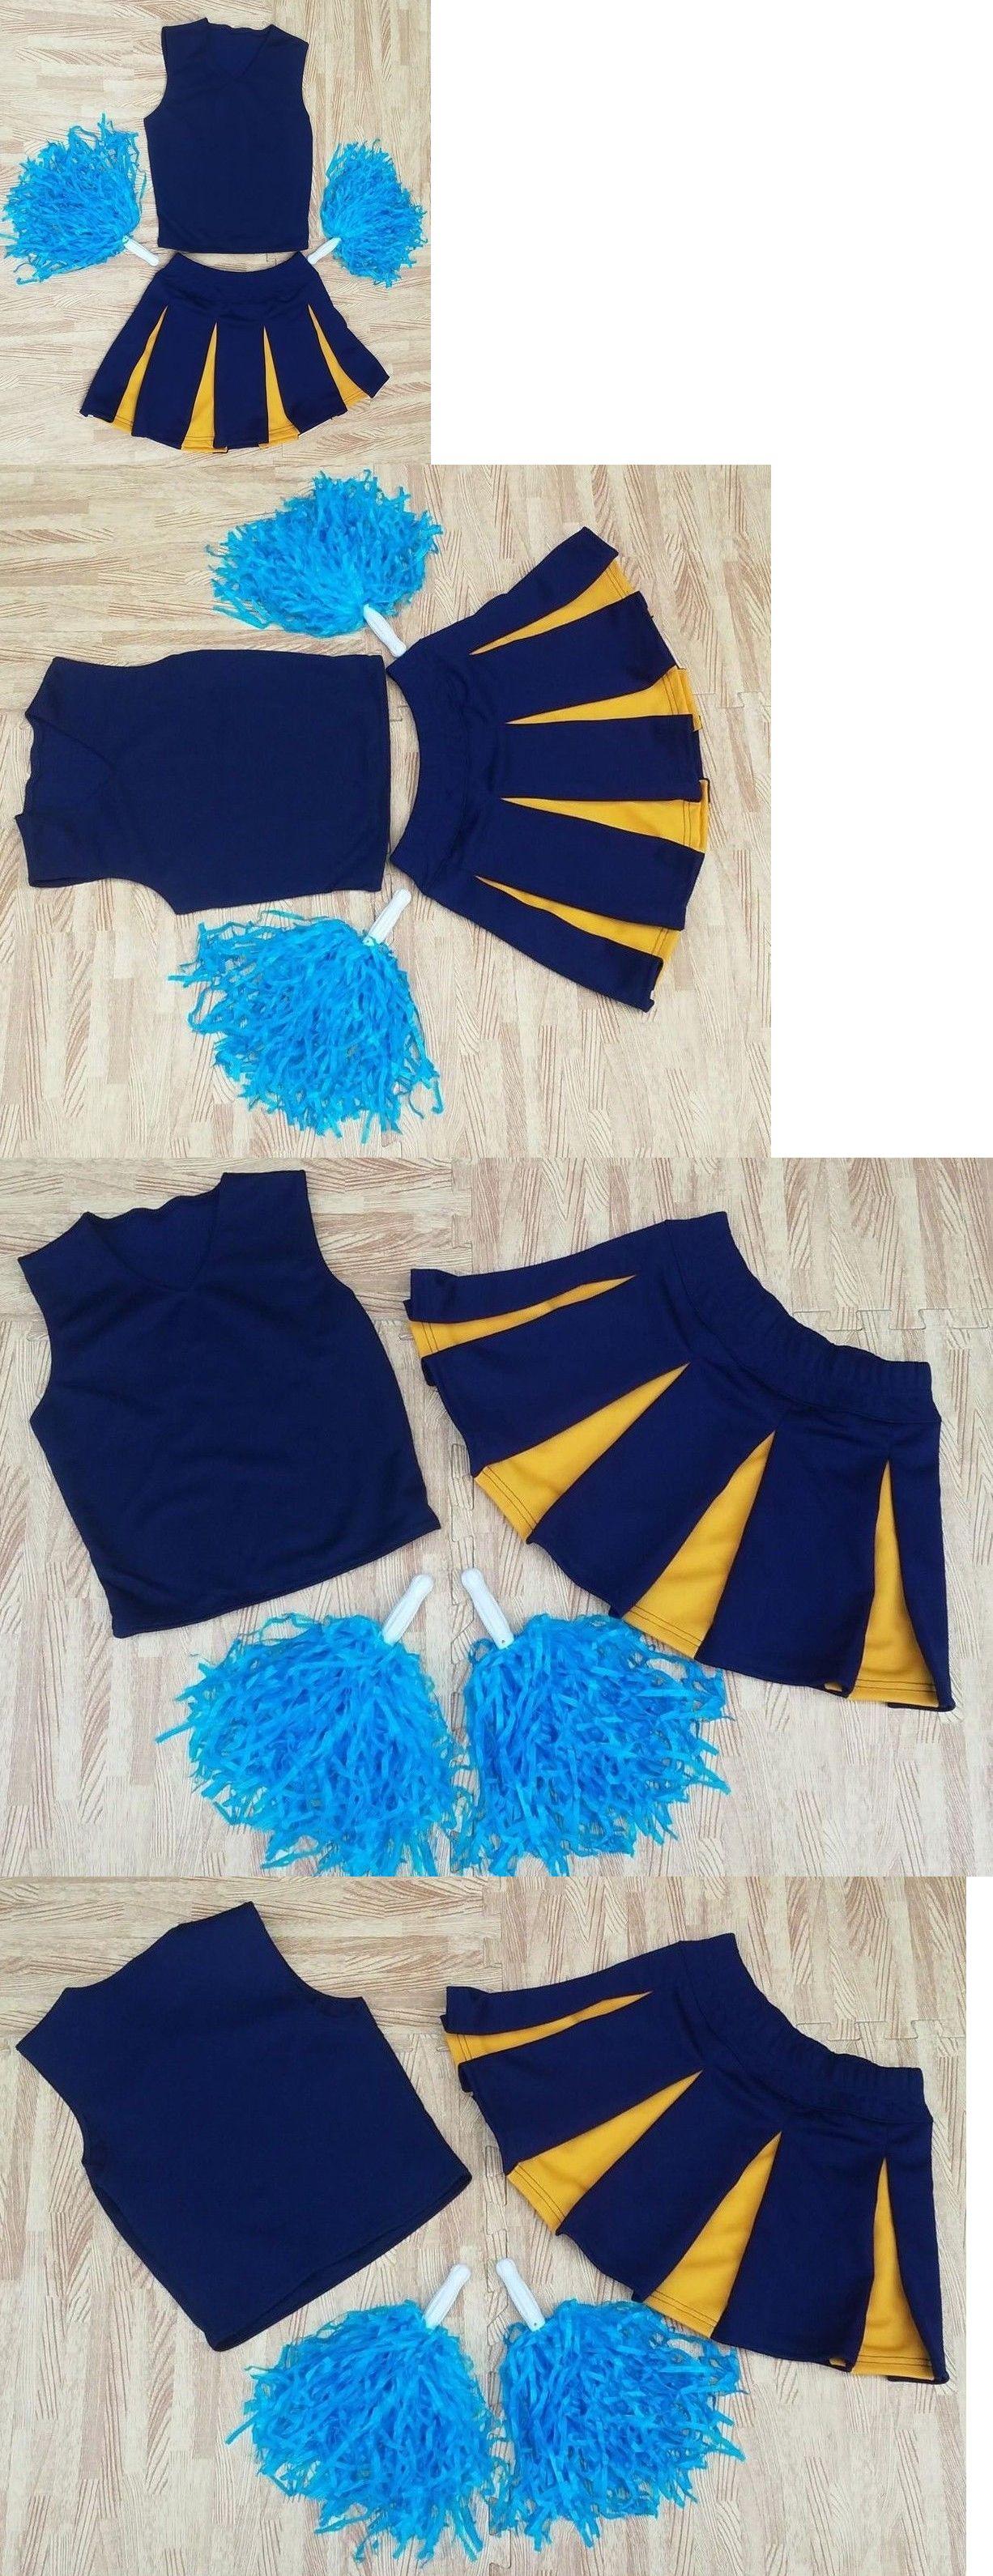 49c5c7c055a Cheerleading 66832 Girl M L Black Real Cheerleader Uniform Top